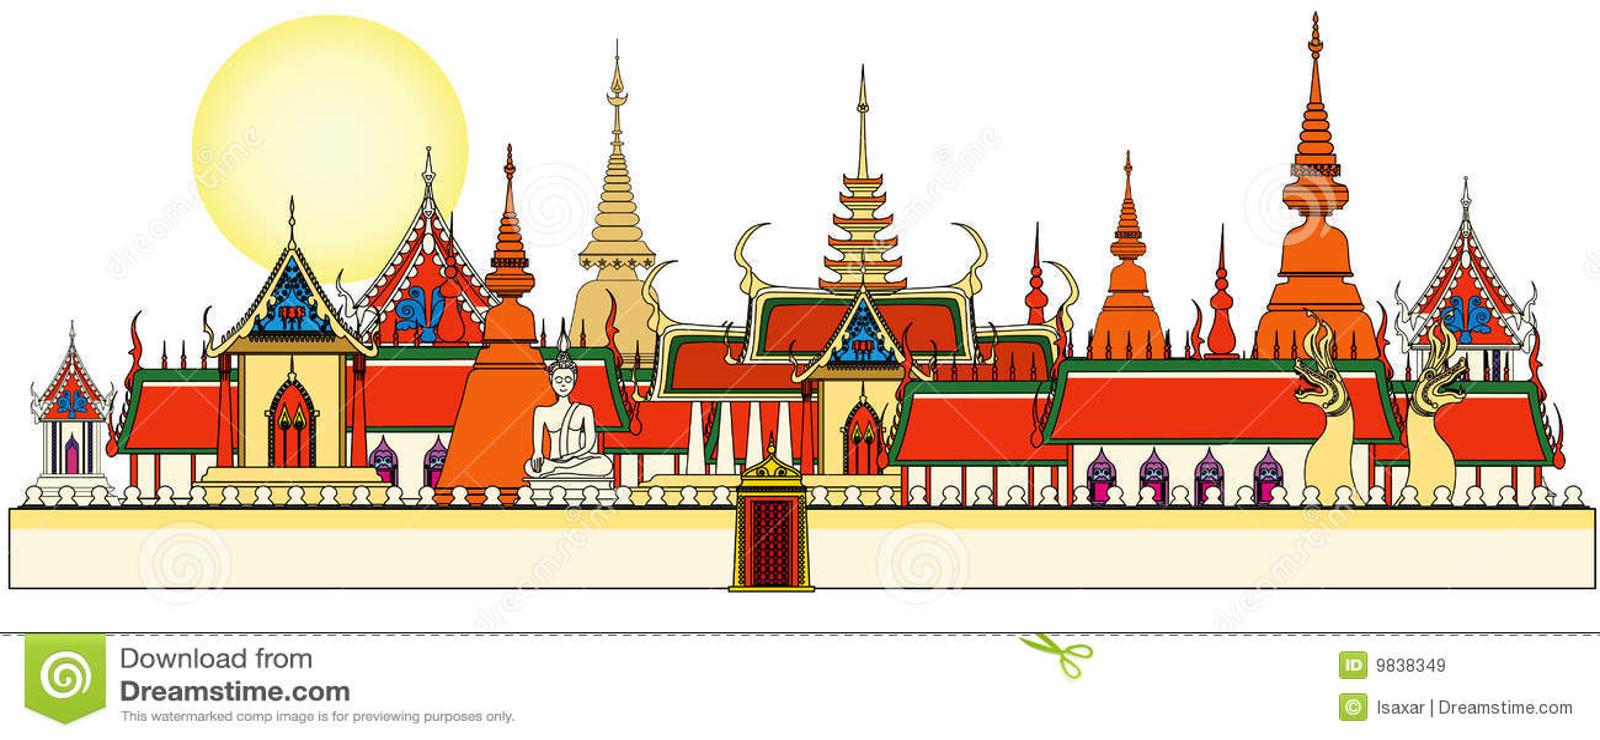 gratis porrsidor royal thai falkenberg